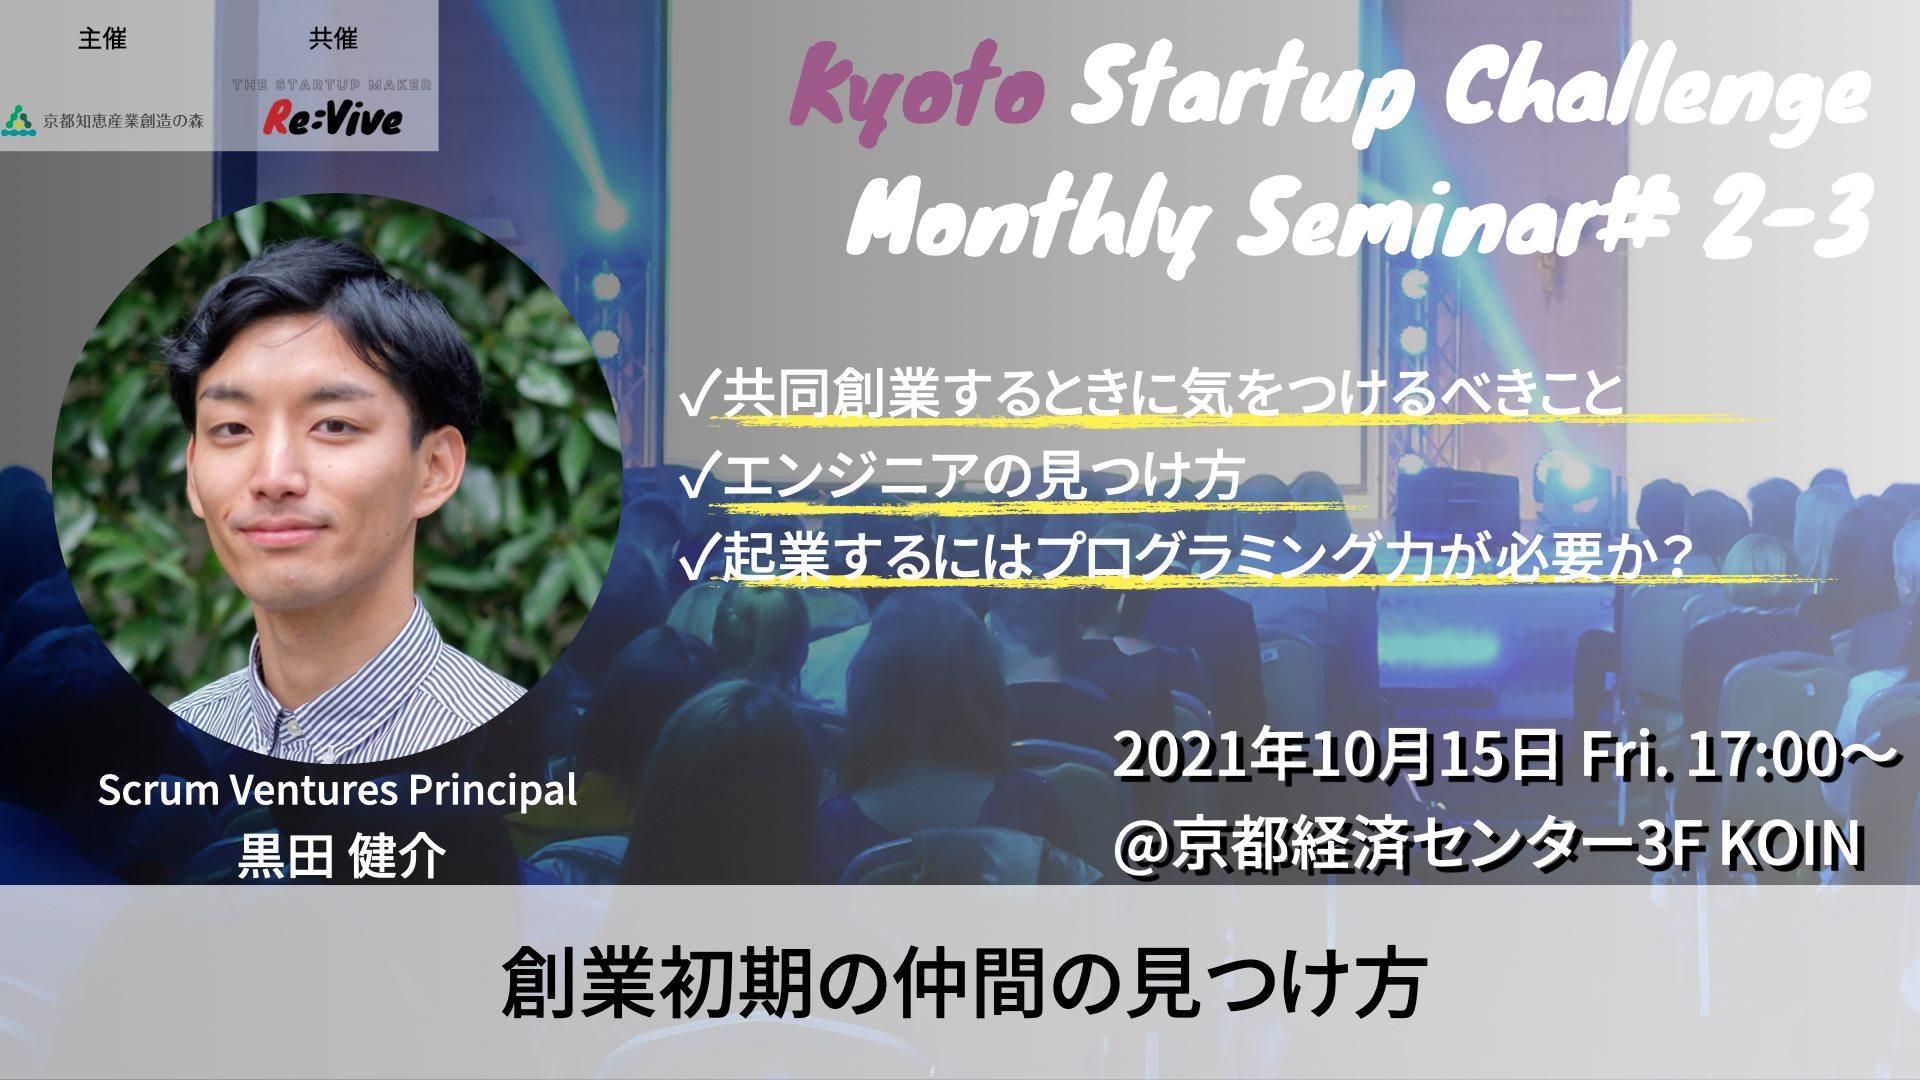 Kyoto Startup Challenge / Seminar 2-3 ~創業初期の仲間の見つけ方~